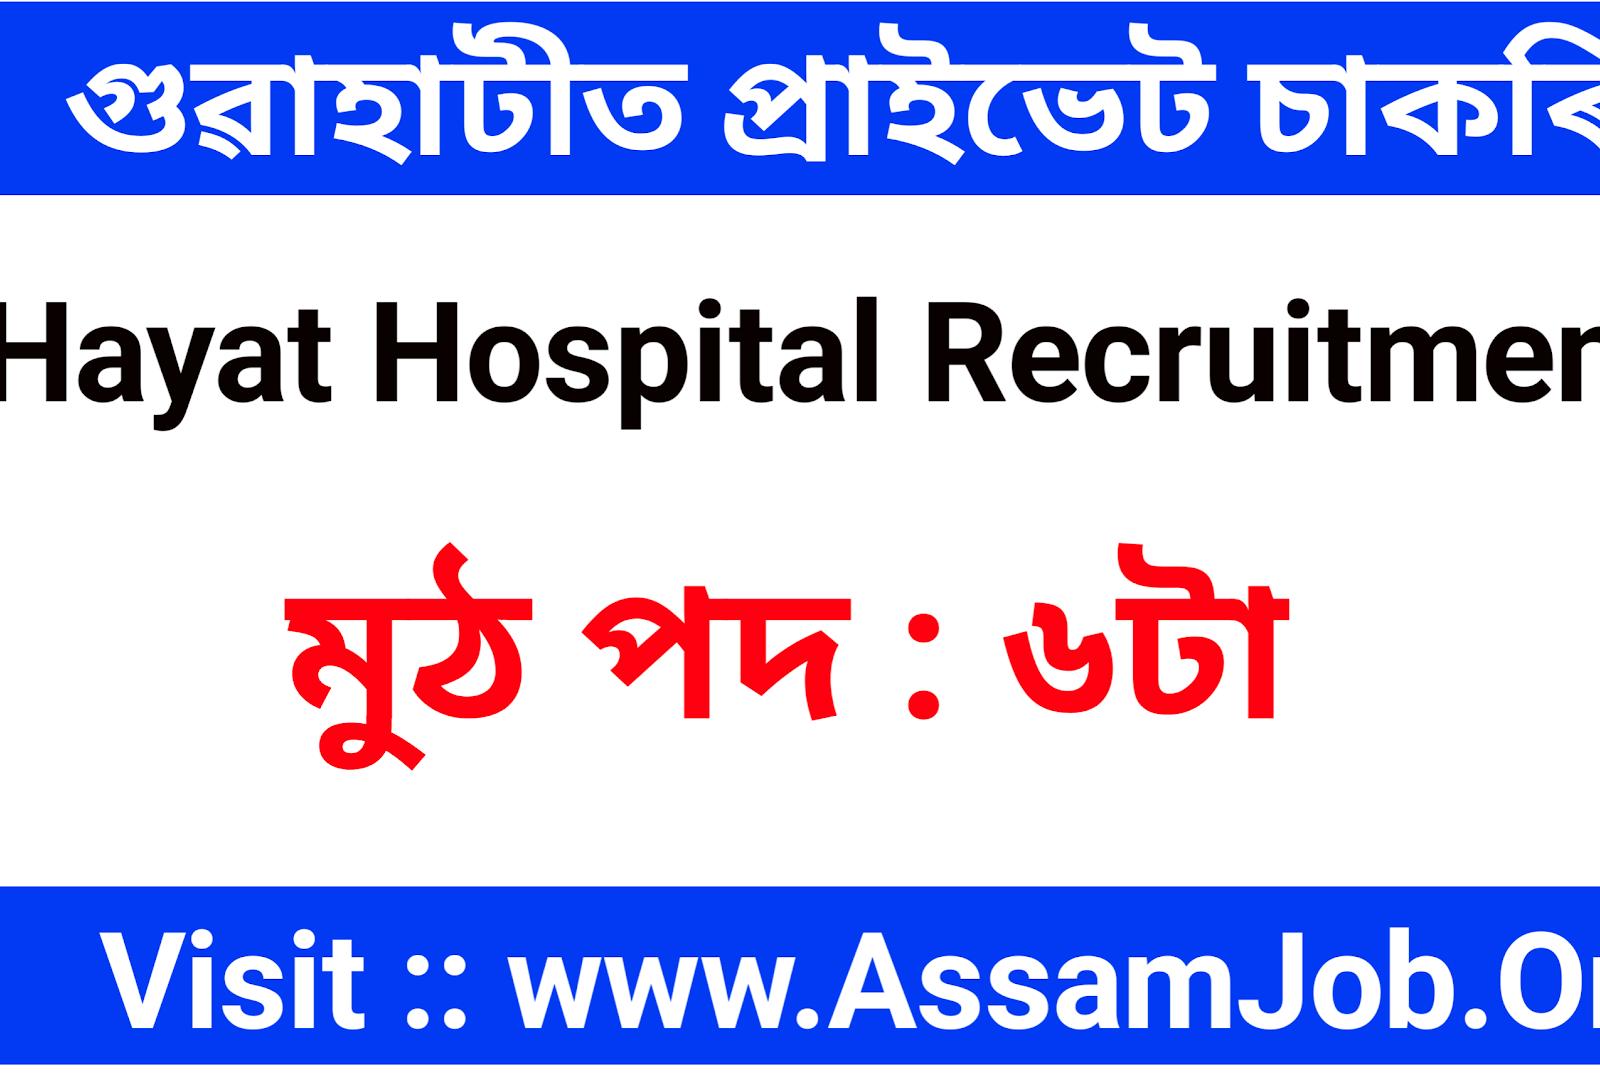 Hayat Hospital Guwahati Recruitment 2021: 6 Manager & Oxygen Operator Posts